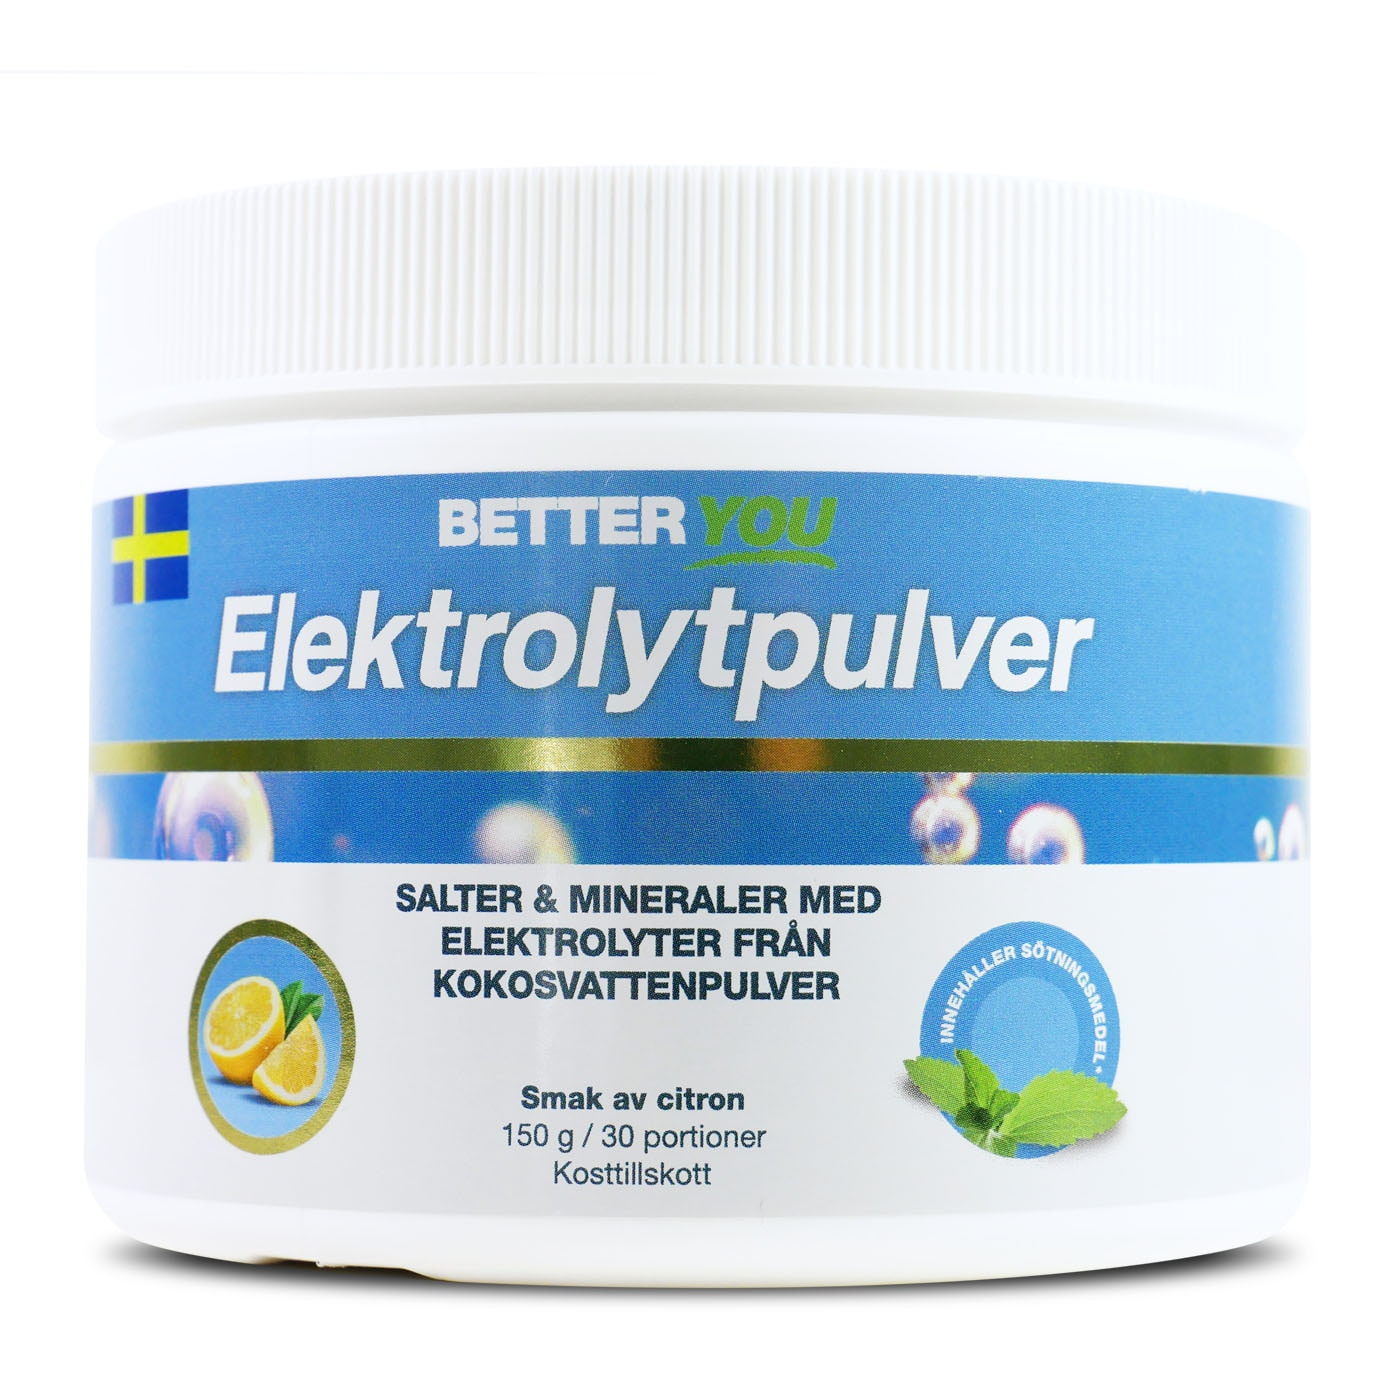 Elektrolytpulver 150 g - Citron